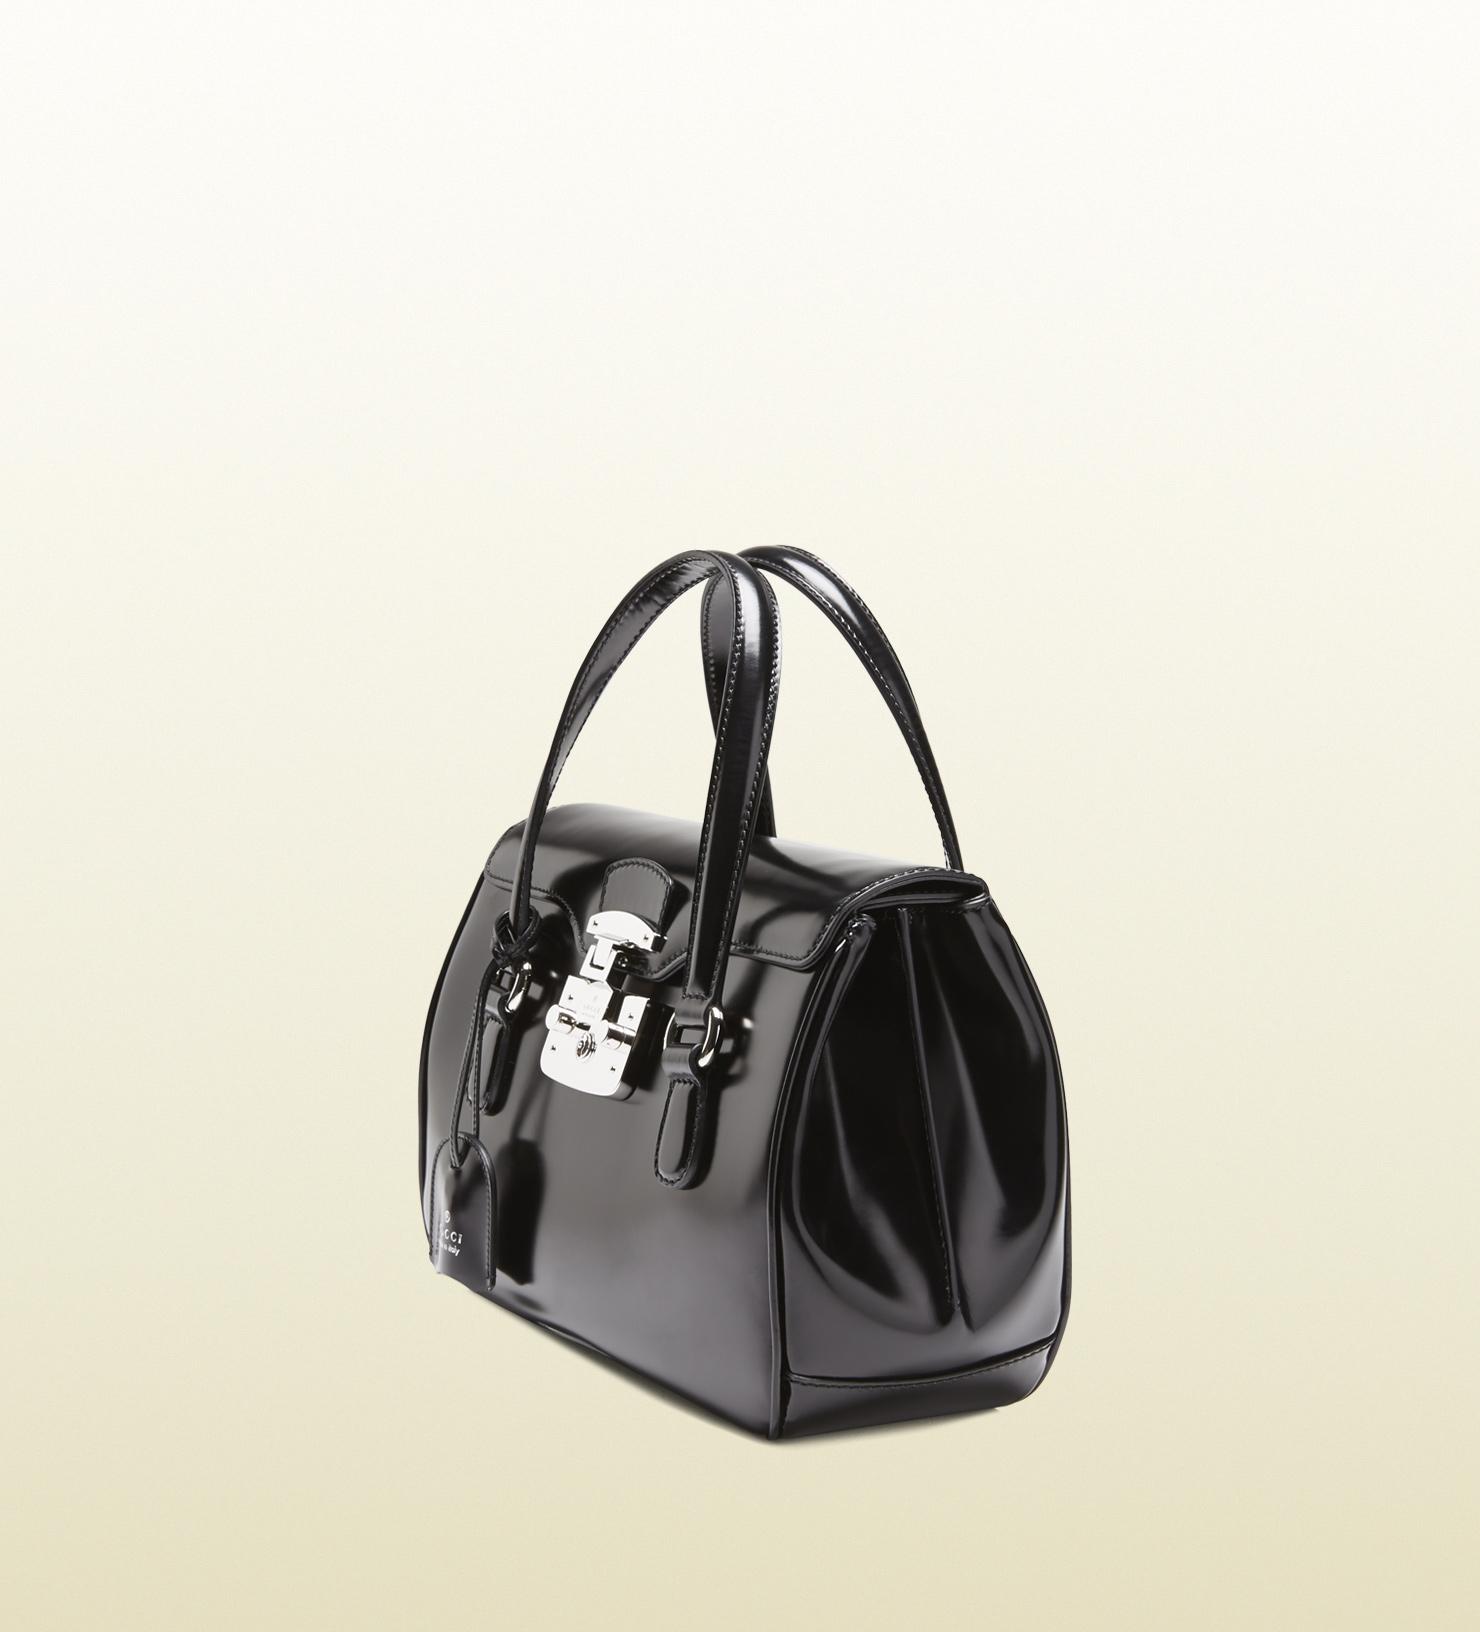 2f6b35c4198 Lyst - Gucci Lady Lock Leather Top Handle Bag in Black